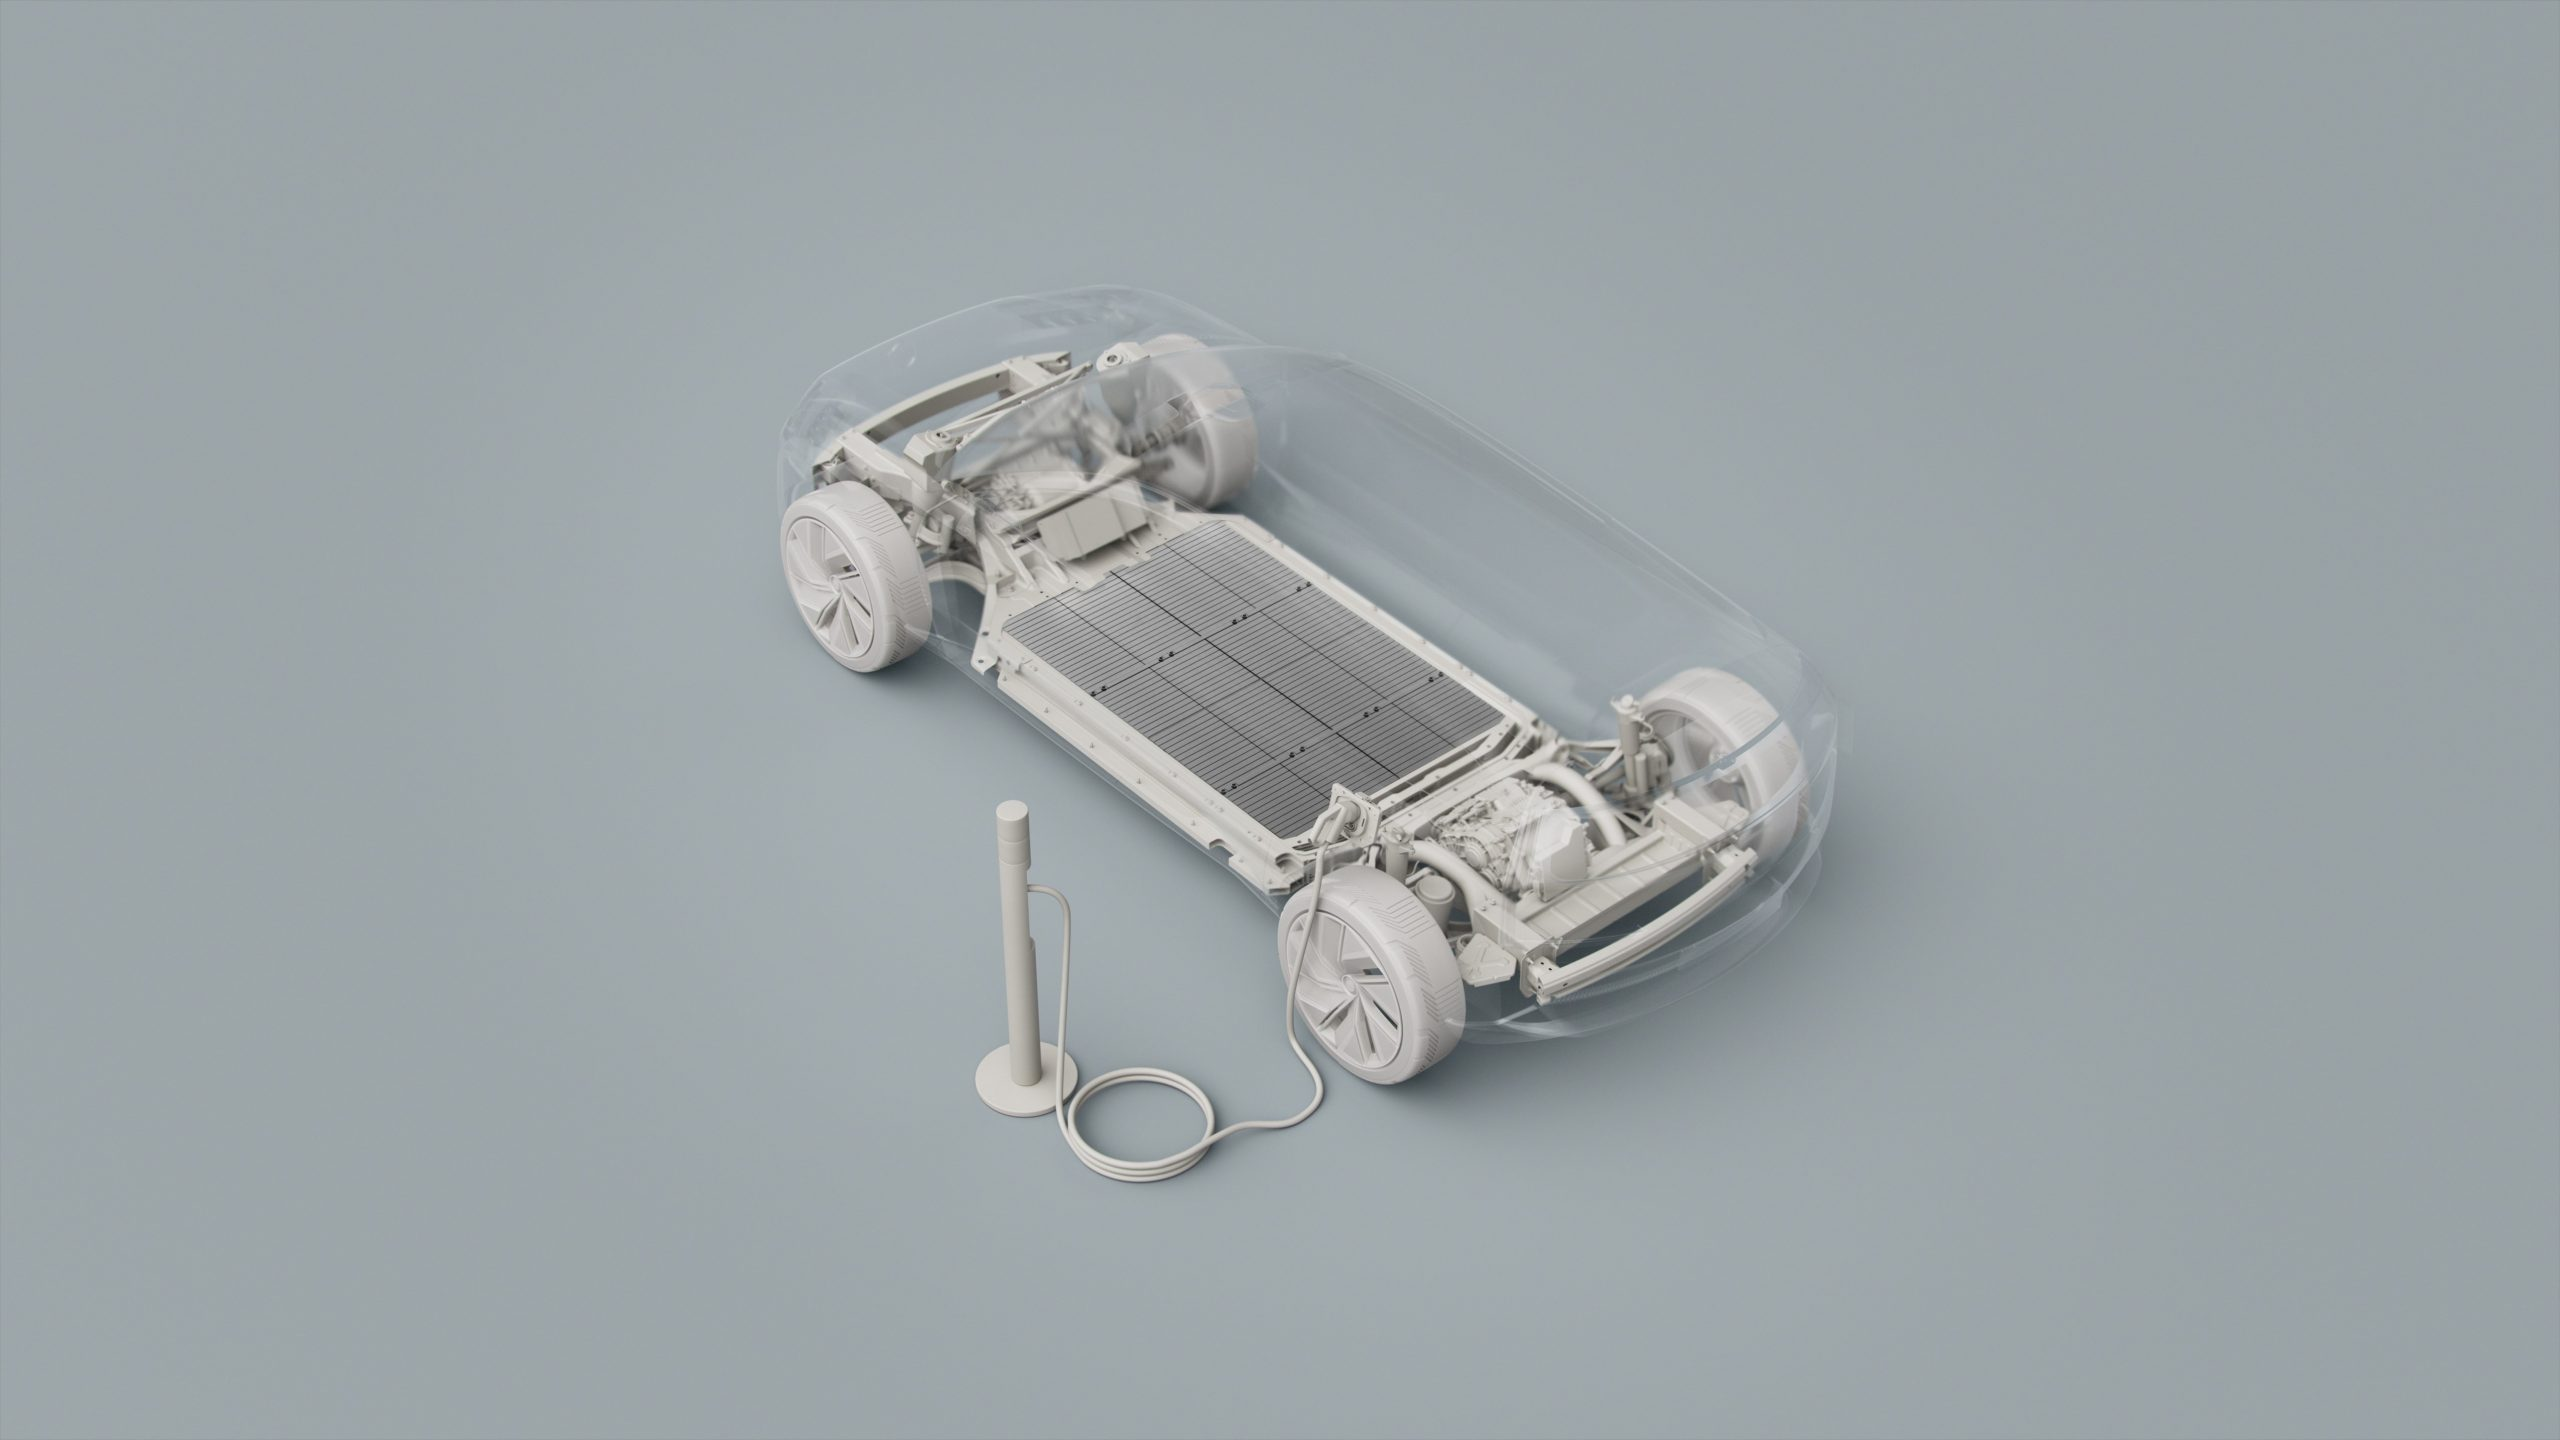 283271 Volvo Car Group and Northvolt to join forces in battery development and scaled Volvo & Northvolt : Συνεργάζονται για την εξέλιξη και την παραγωγή μπαταριών Electric cars, electric vehicles, Northvolt, Volvo, Volvo Cars, ειδήσεις, ηλεκτρικά, ηλεκτροκινηση, μπαταρία, Νέα